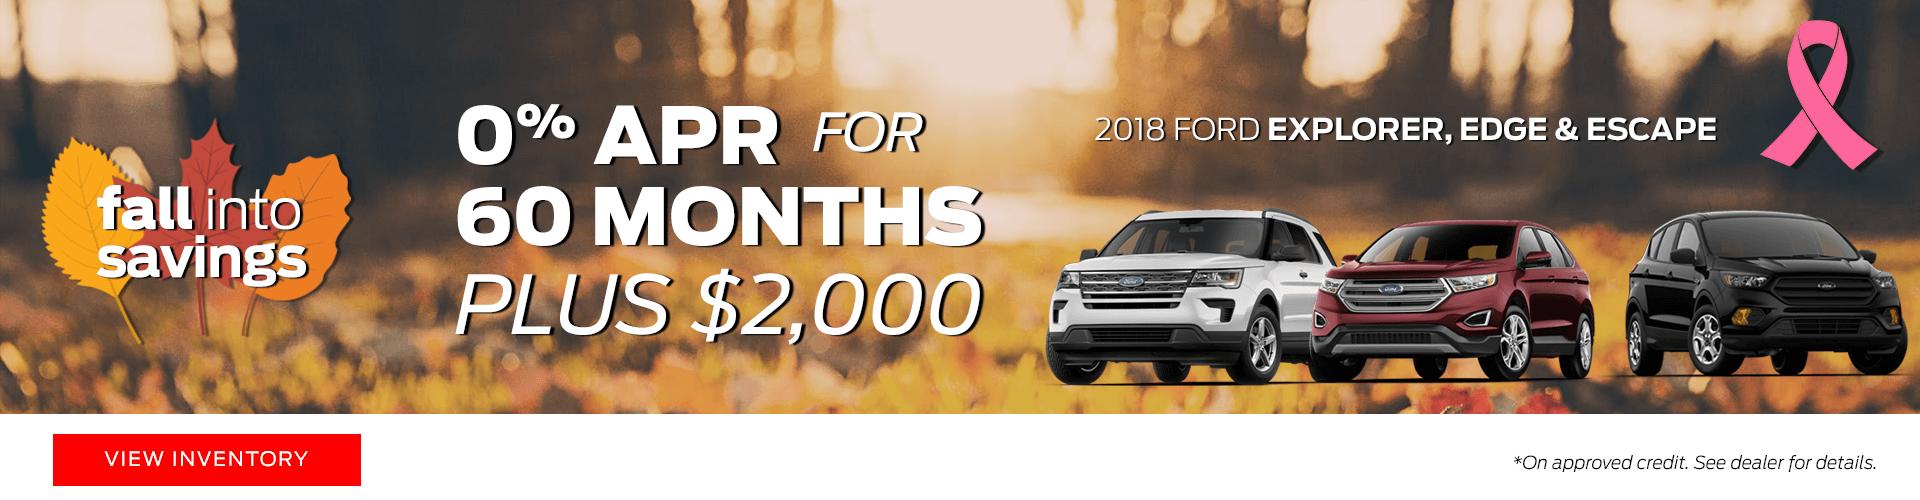 2018 Ford Explorer, Edge & Escape Special